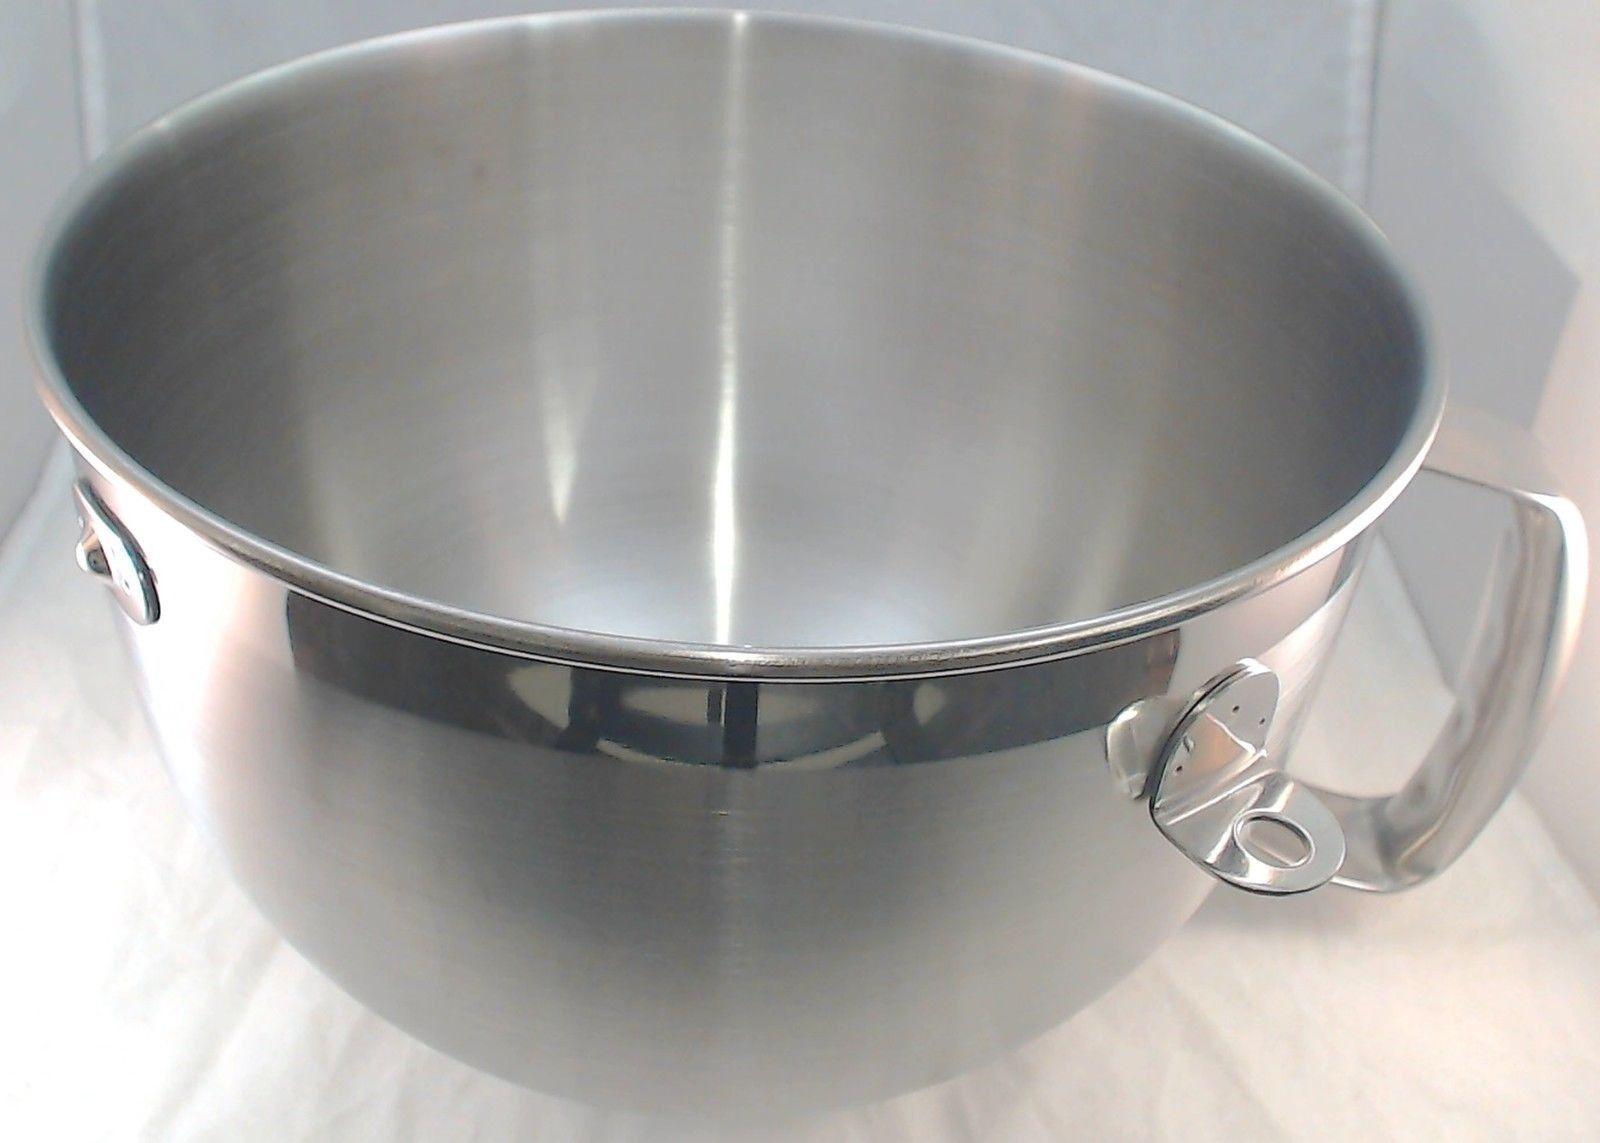 Kitchenaid Stand Mixer 6qt S S Bowl Ap4507763 Ps2377036 W10245586 Ebay